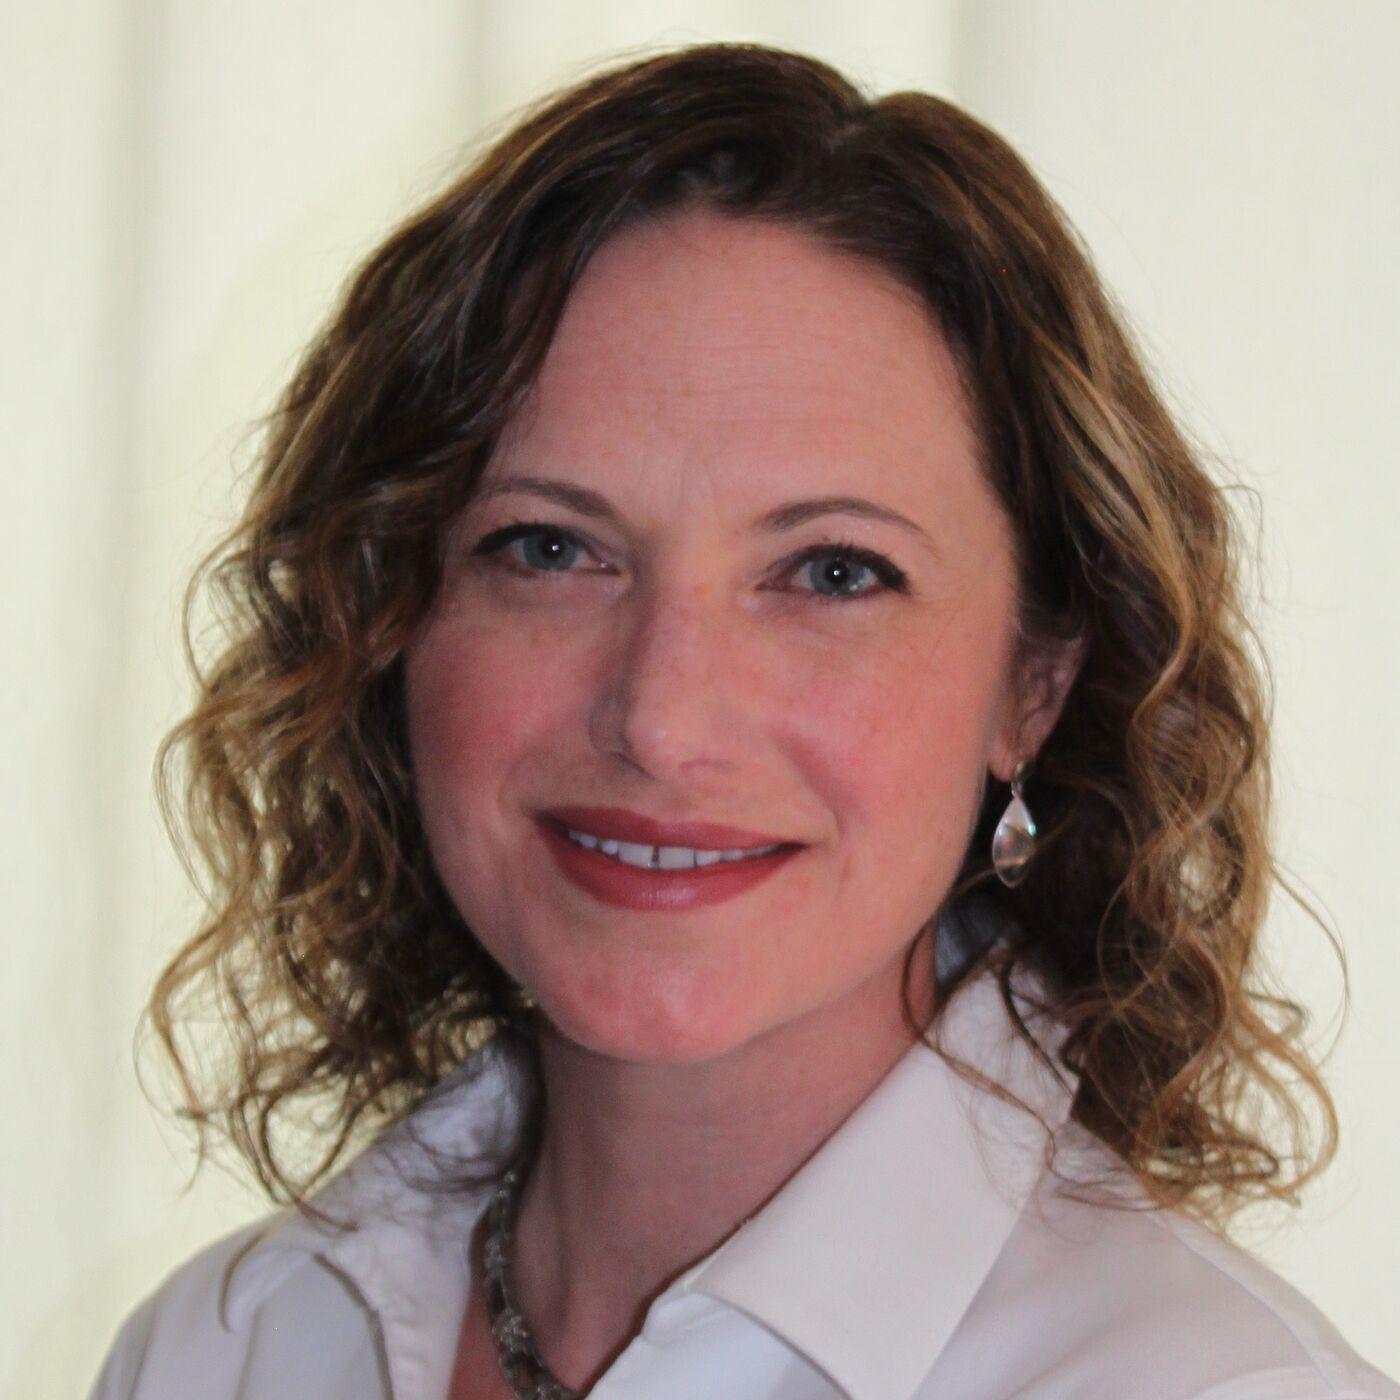 2018 Nevada Teacher of the Year: Pilar Biller